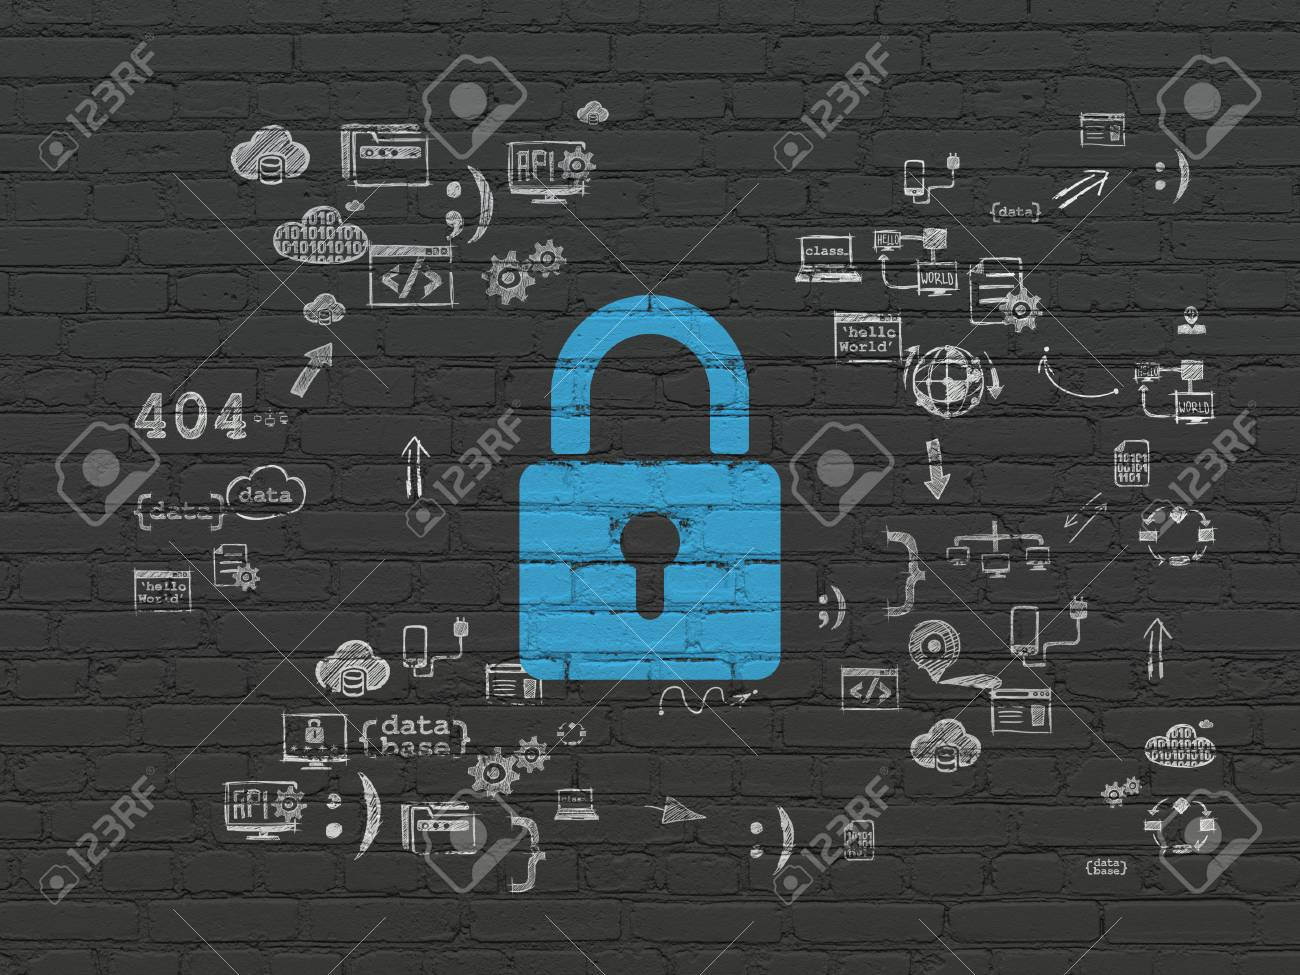 Datenschutzkonzept: Blau Bemalt Geschlossenes Vorhängeschloß-Symbol ...